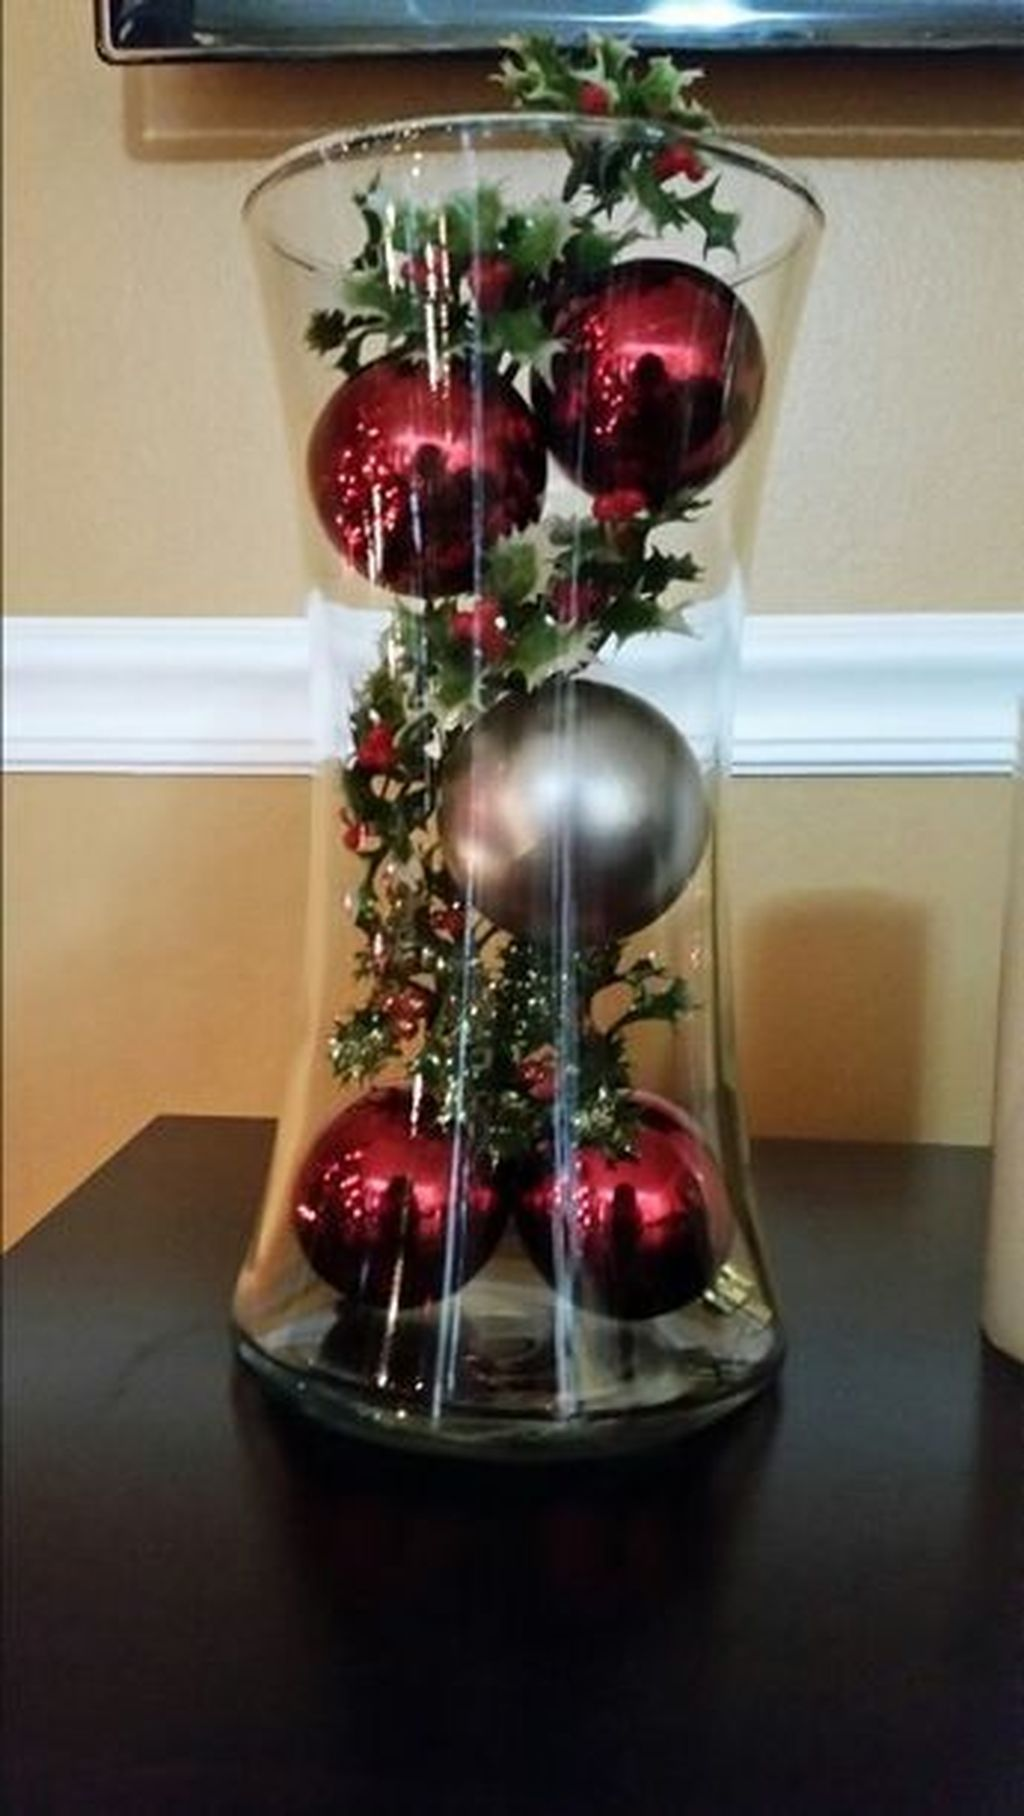 50 Brilliant Diy Centerpiece Christmas Table Decorating Ideas To Copy In 2020 Christmas Table Centerpieces Christmas Table Decorations Christmas Decor Diy